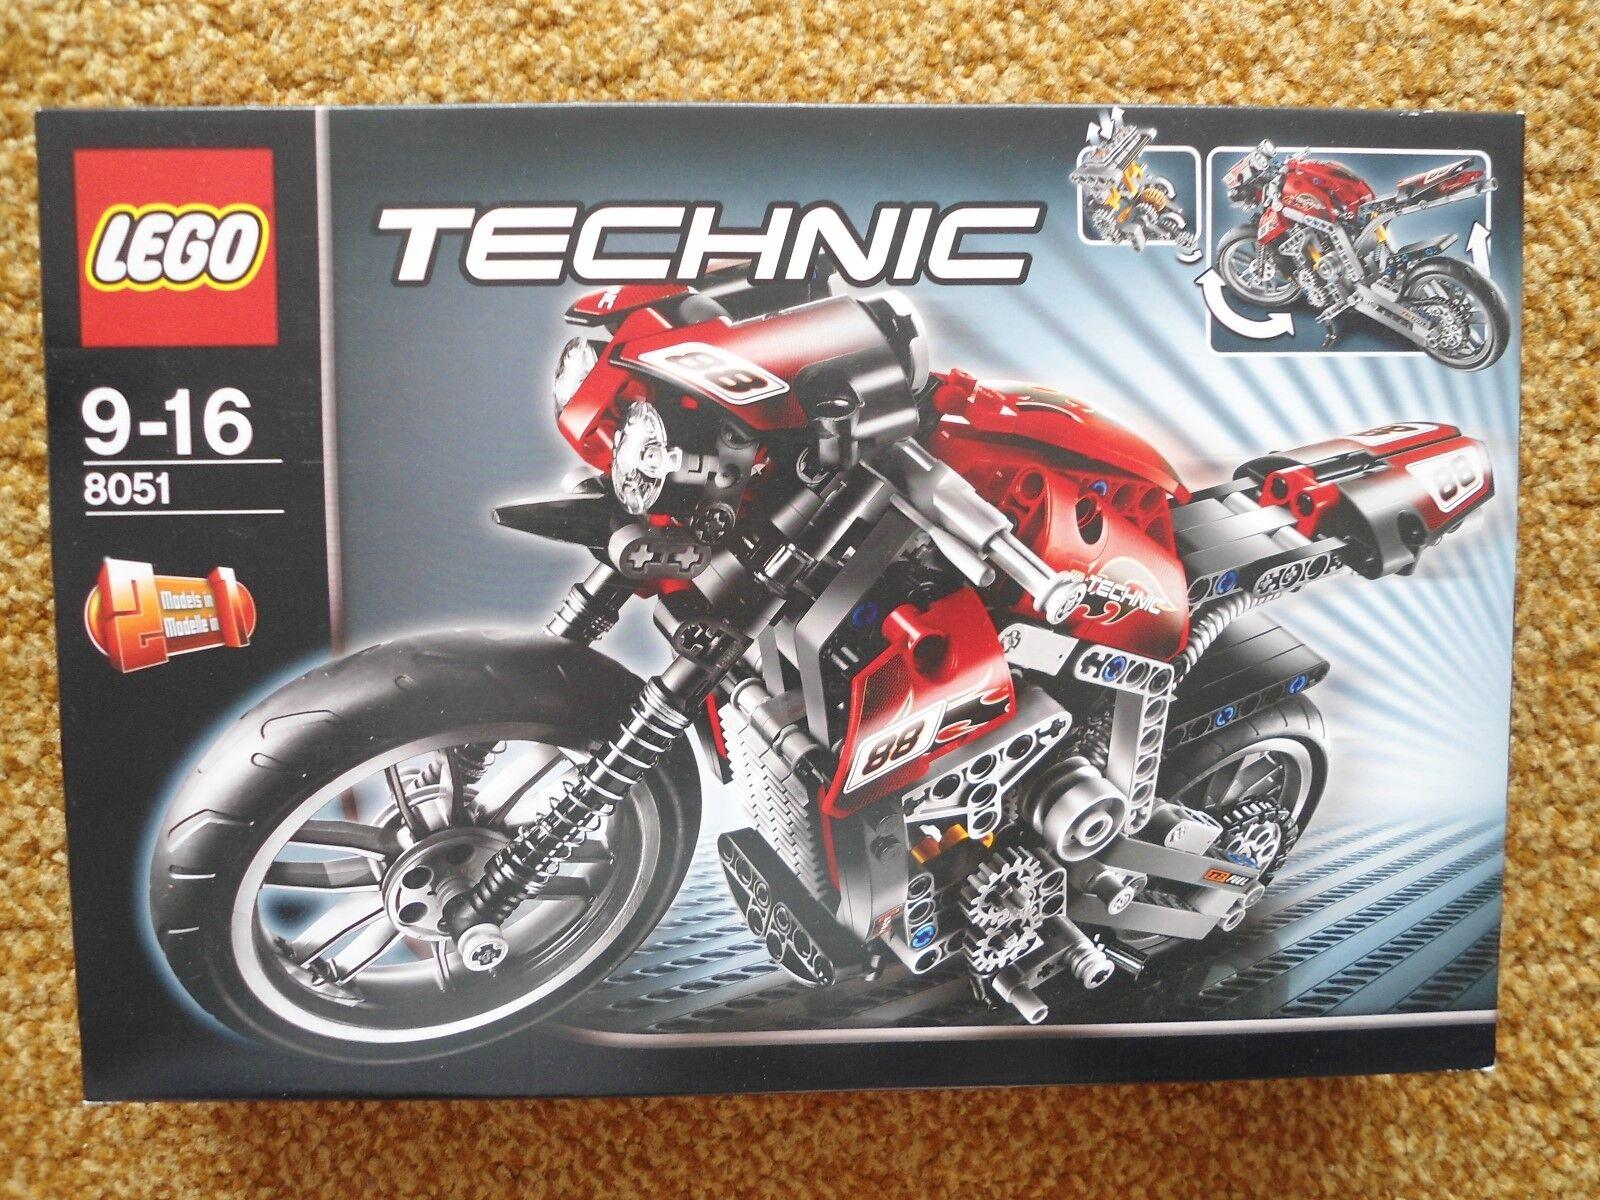 LEGO Technic Motorrad 8051 Neu und OVP